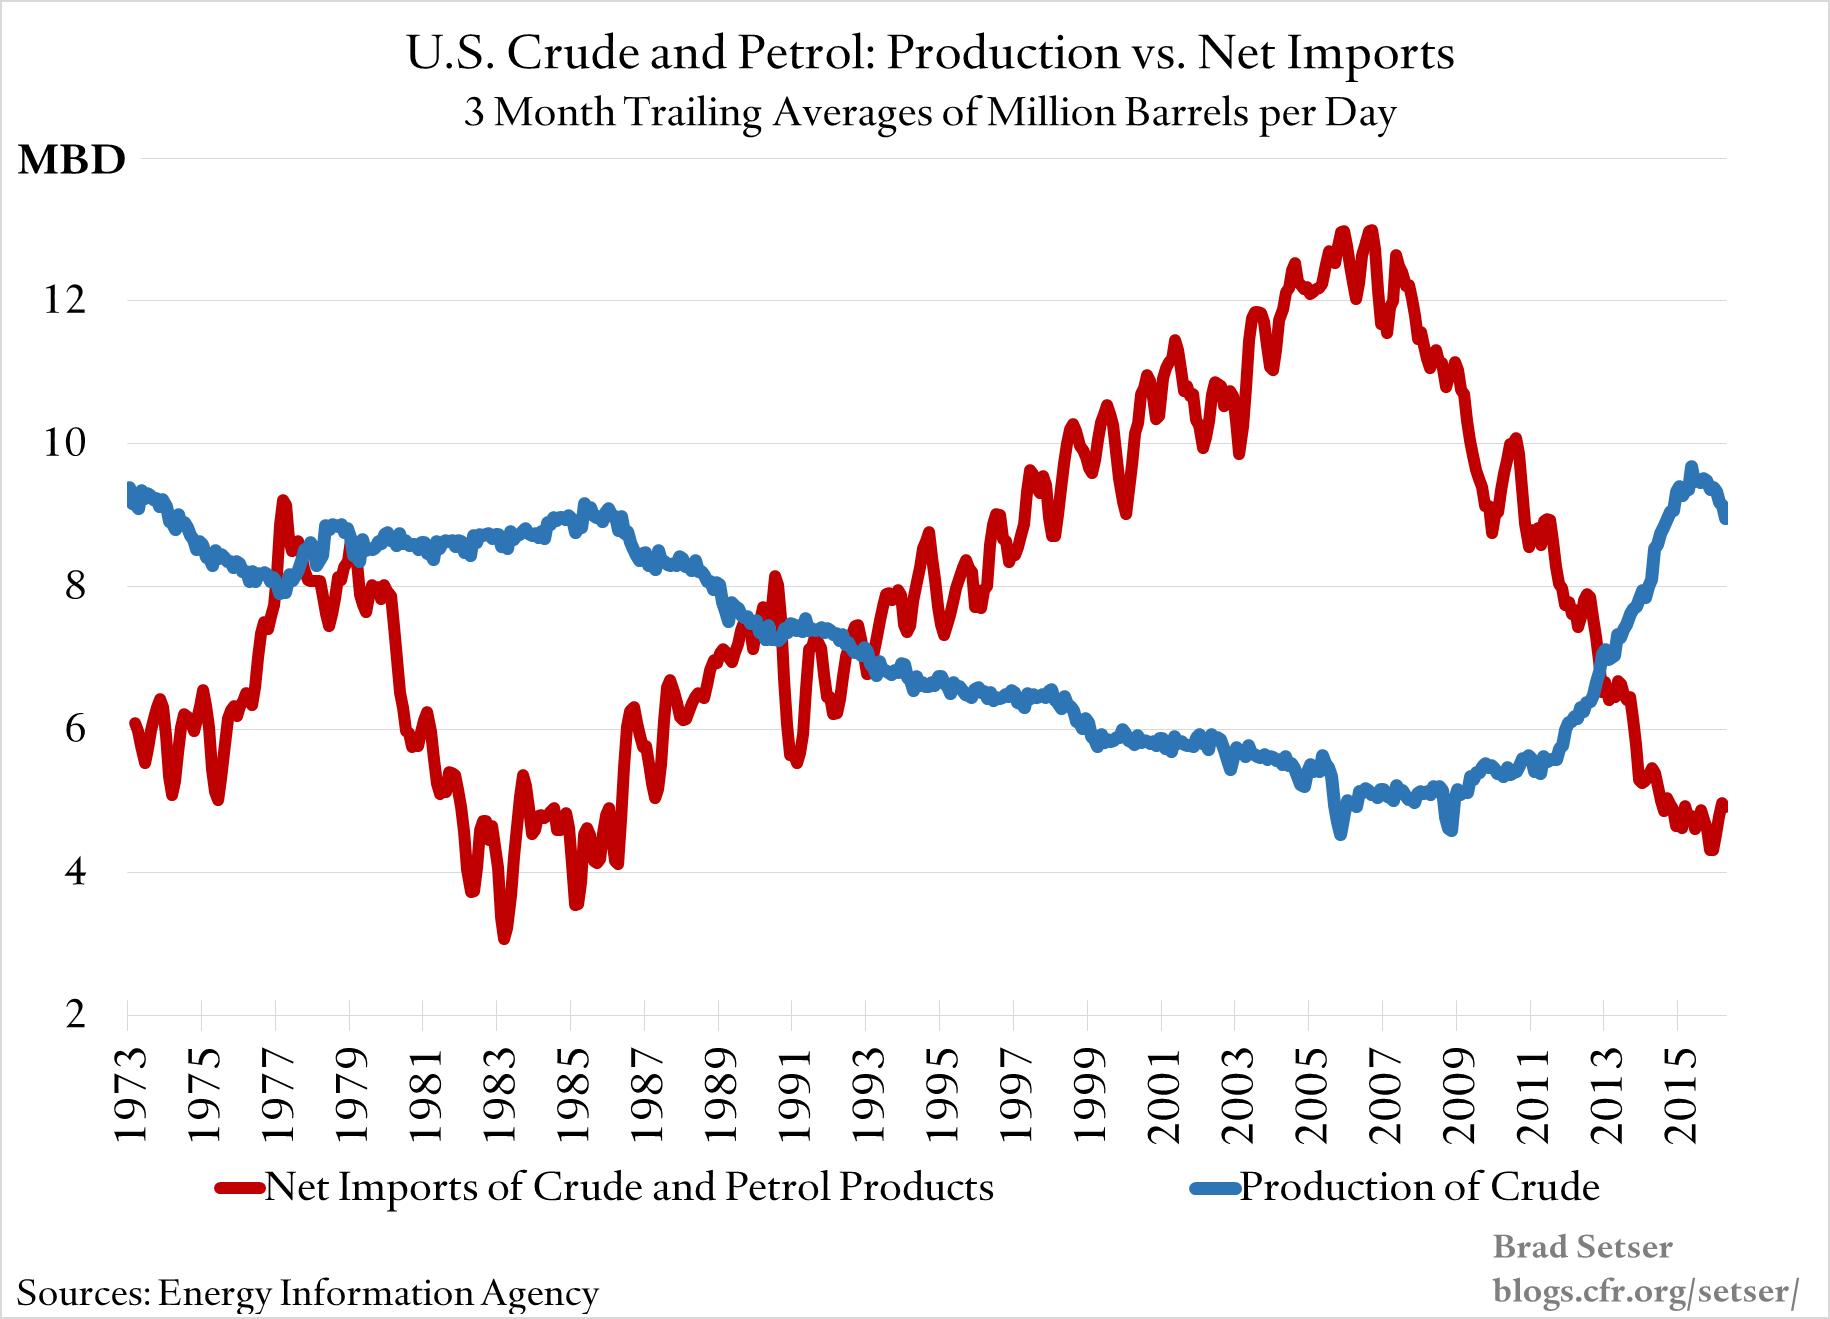 US-Crude-Petrol-Production-Versus-Net-Imports